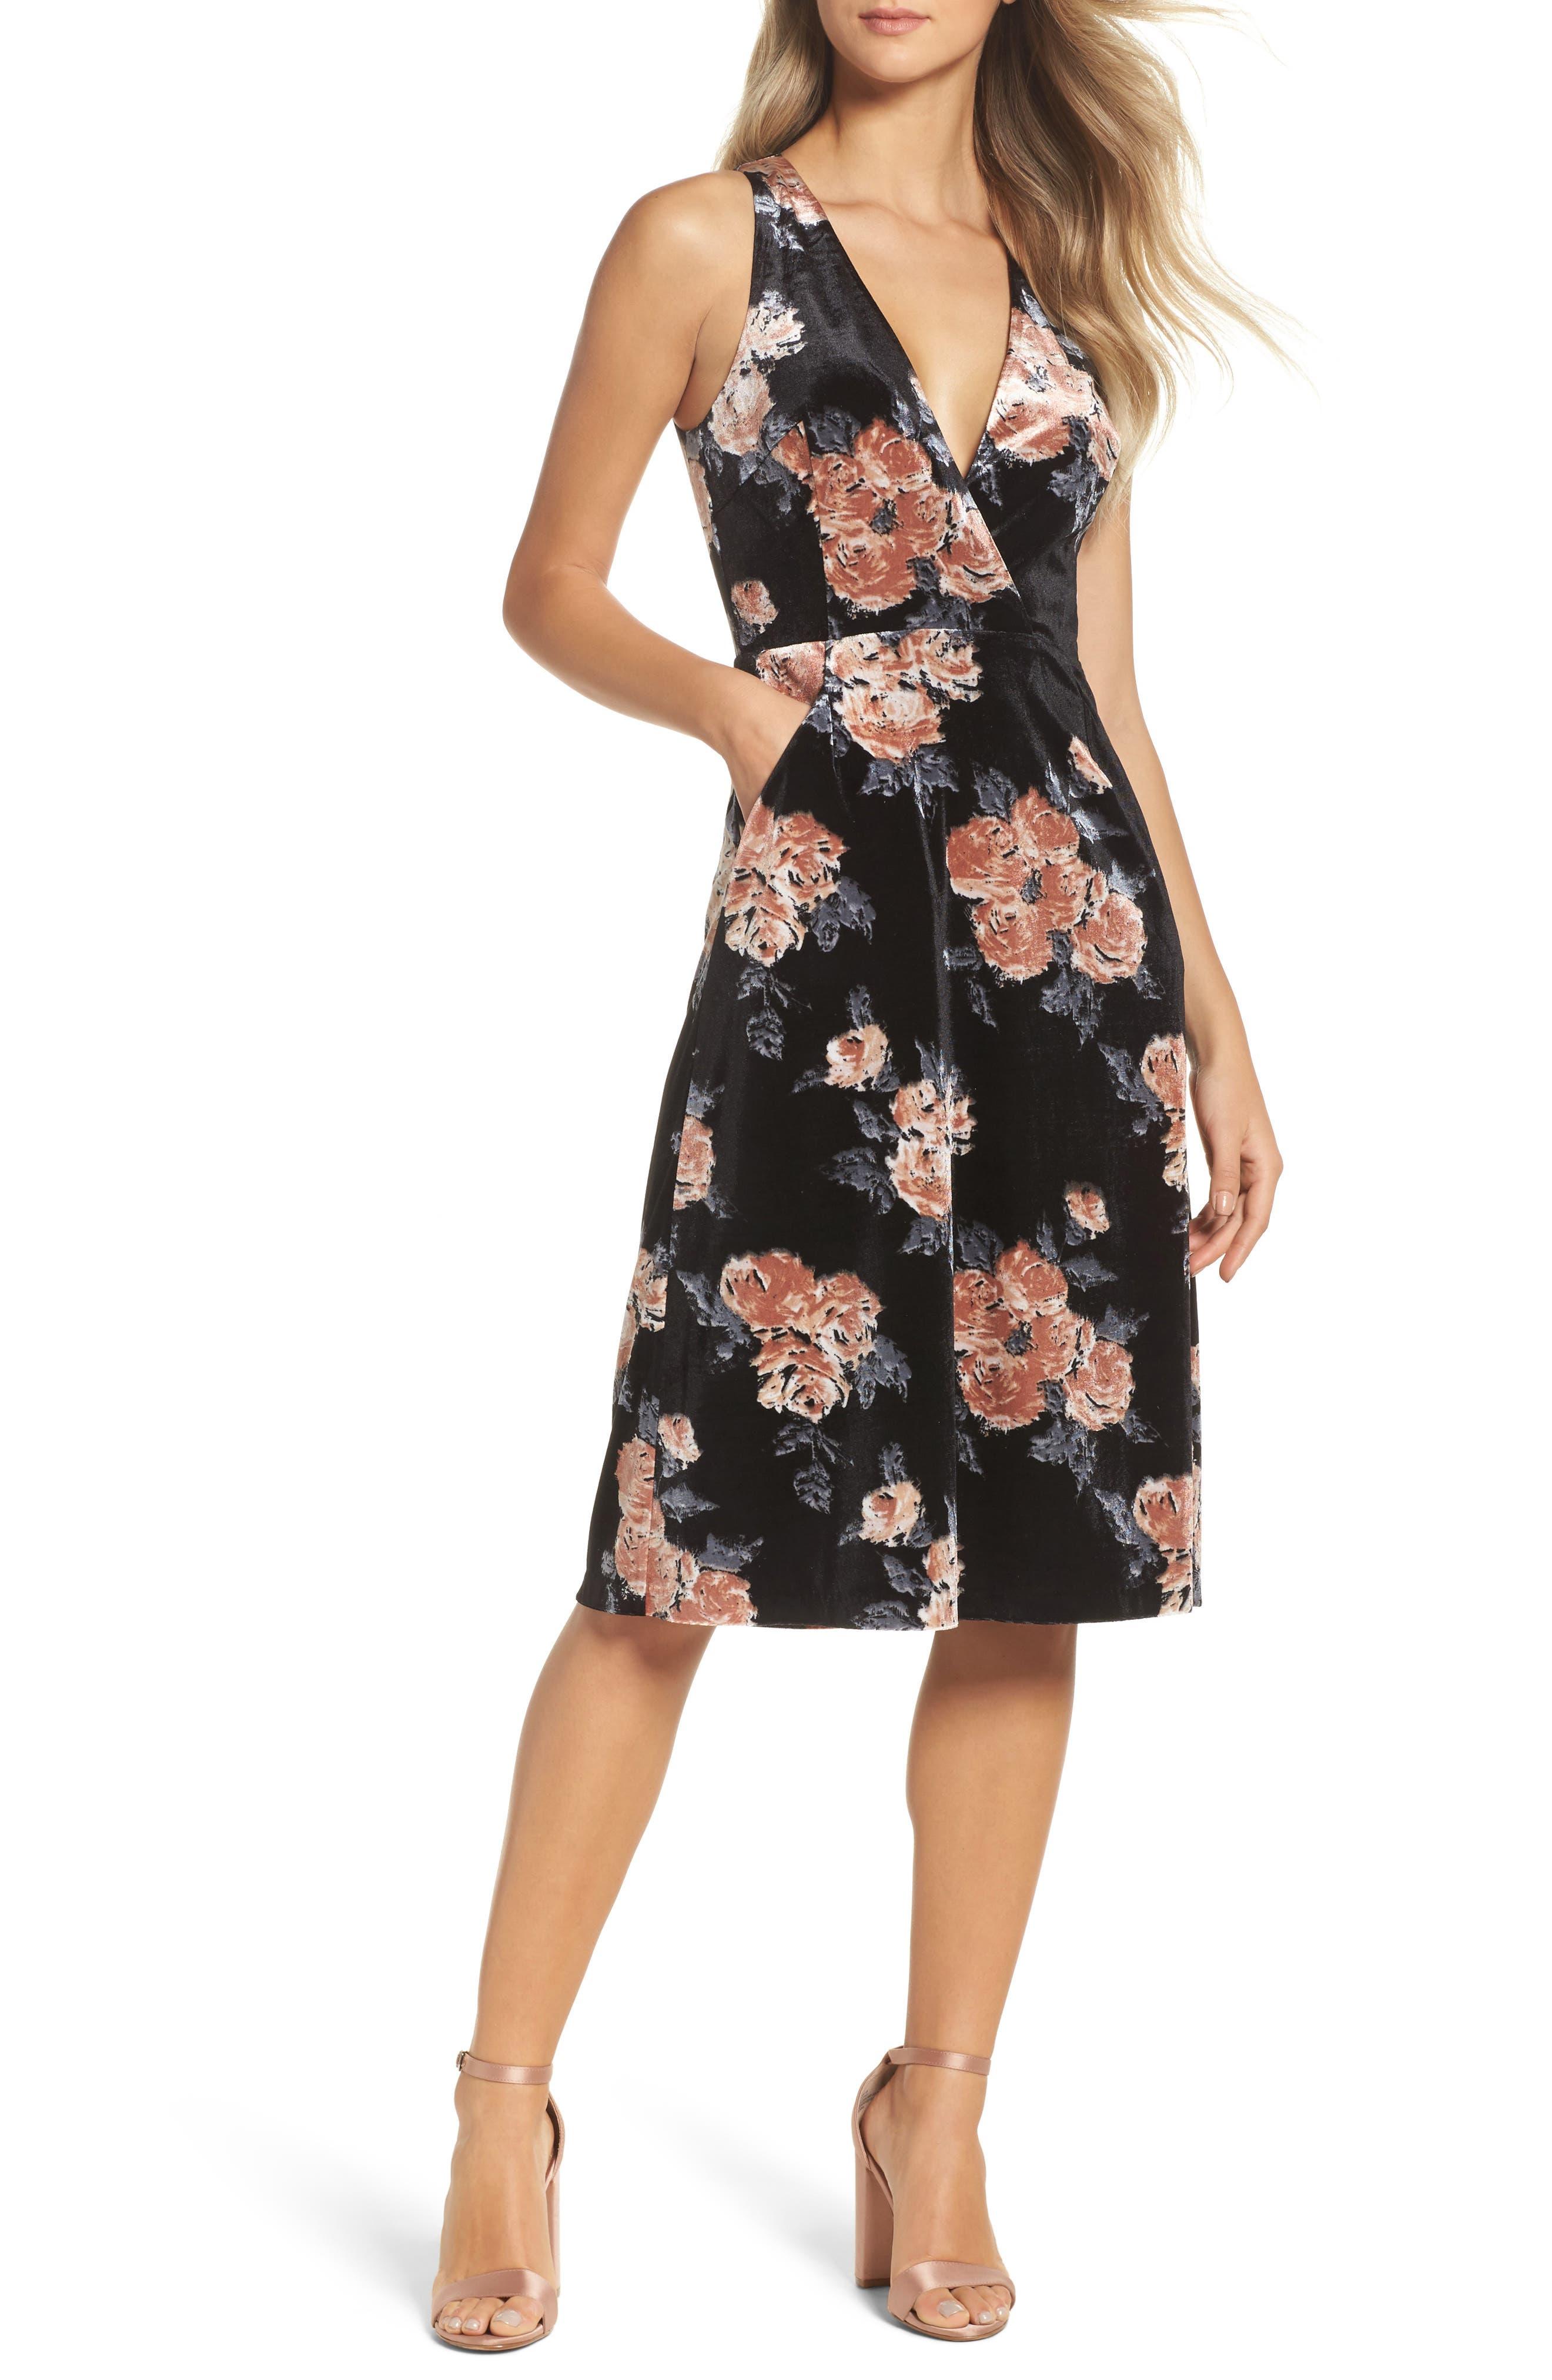 Costes Velvet Fit & Flare Dress,                         Main,                         color, Black Rosettes